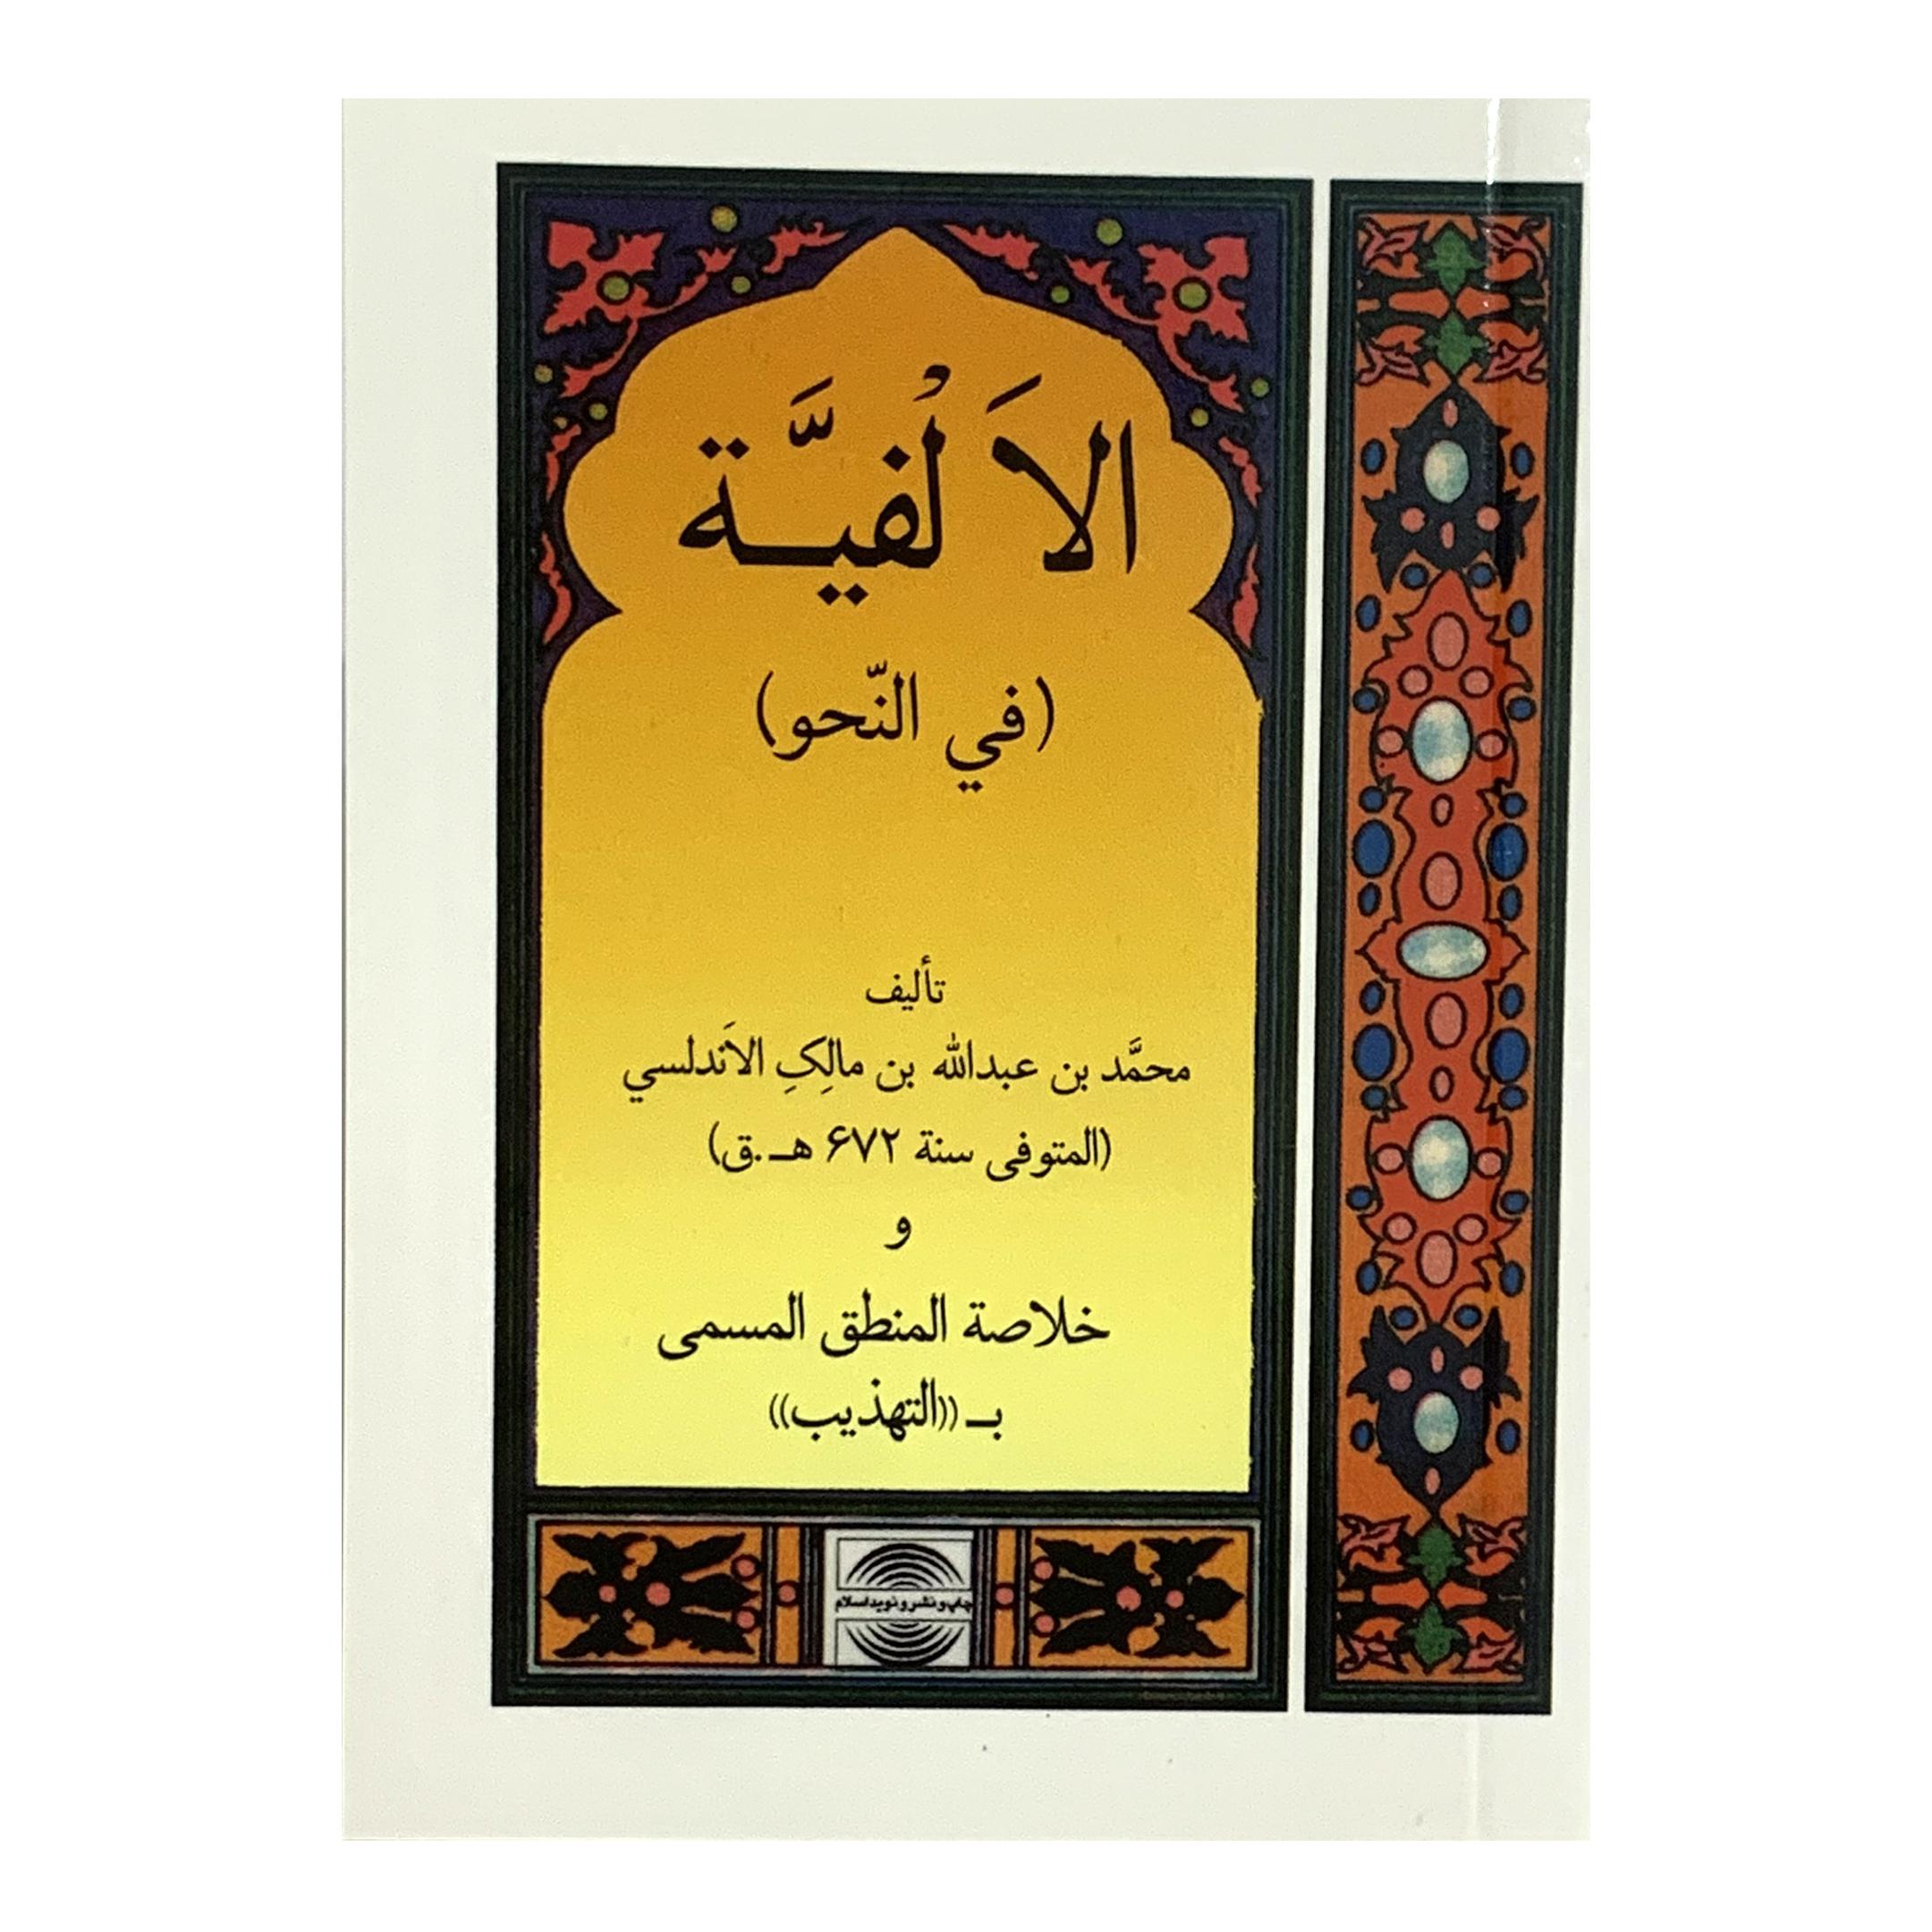 کتاب الالفیه فی النحو اثر محمد بن عبدالله بن مالک الاندلسی انتشارات نوید اسلام